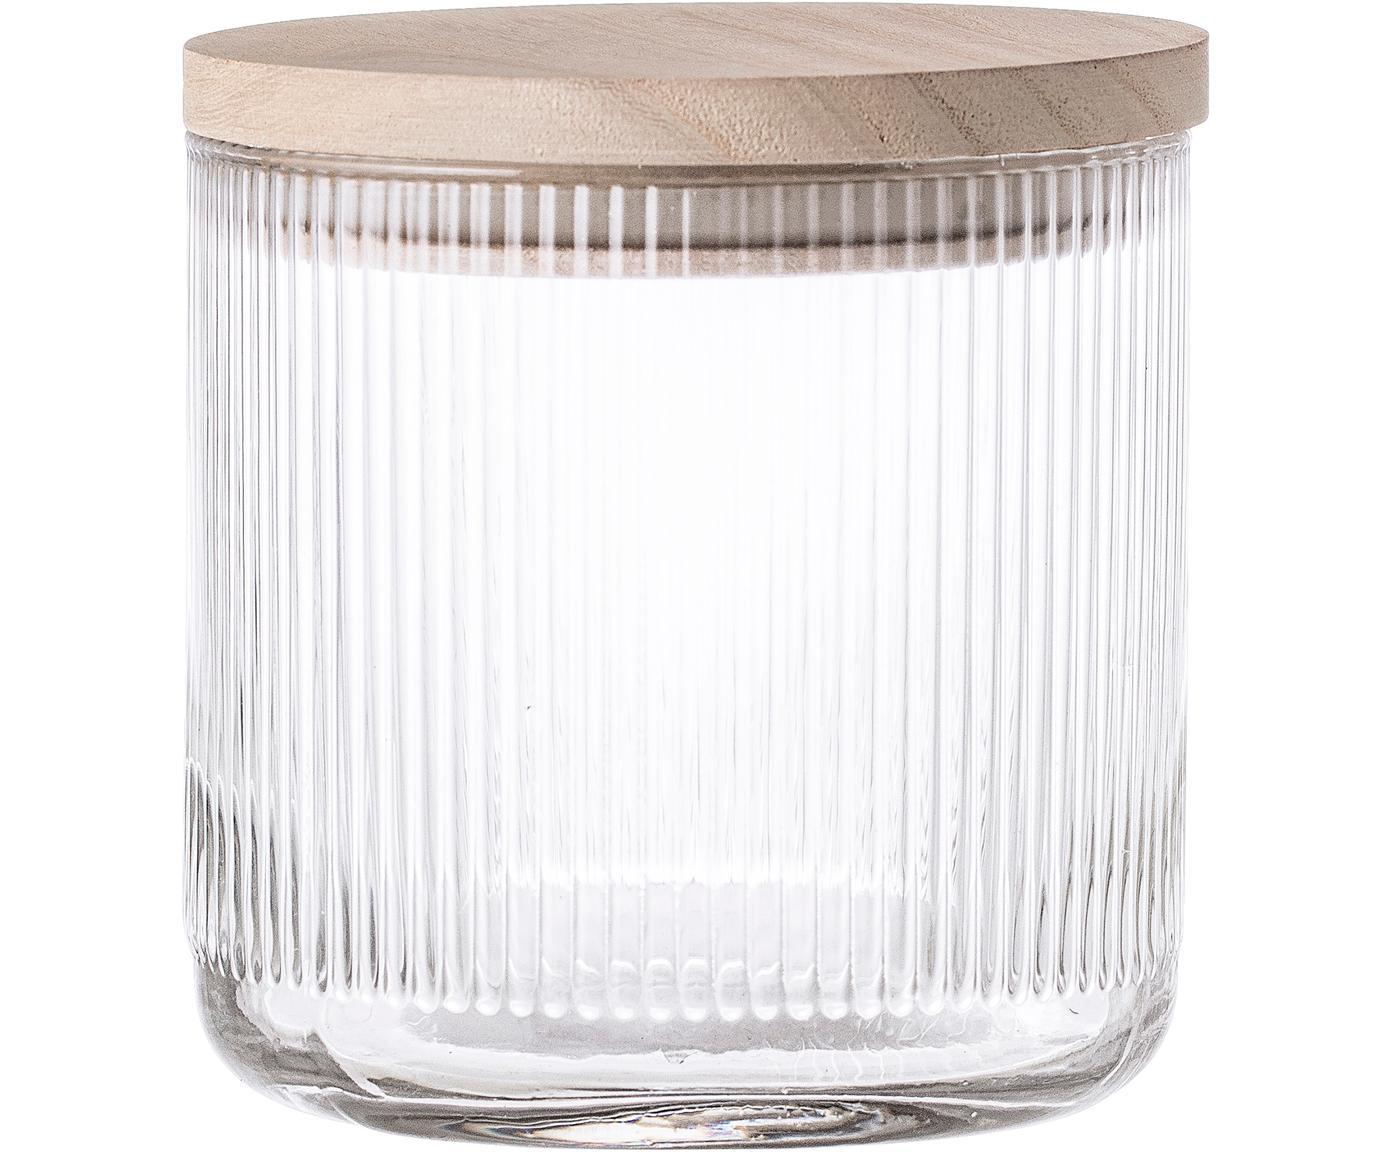 Glazen opbergpot Gianna met groefstructuur, Deksel: hout, siliconen, Transparant, bruin, Ø 12 x H 12 cm